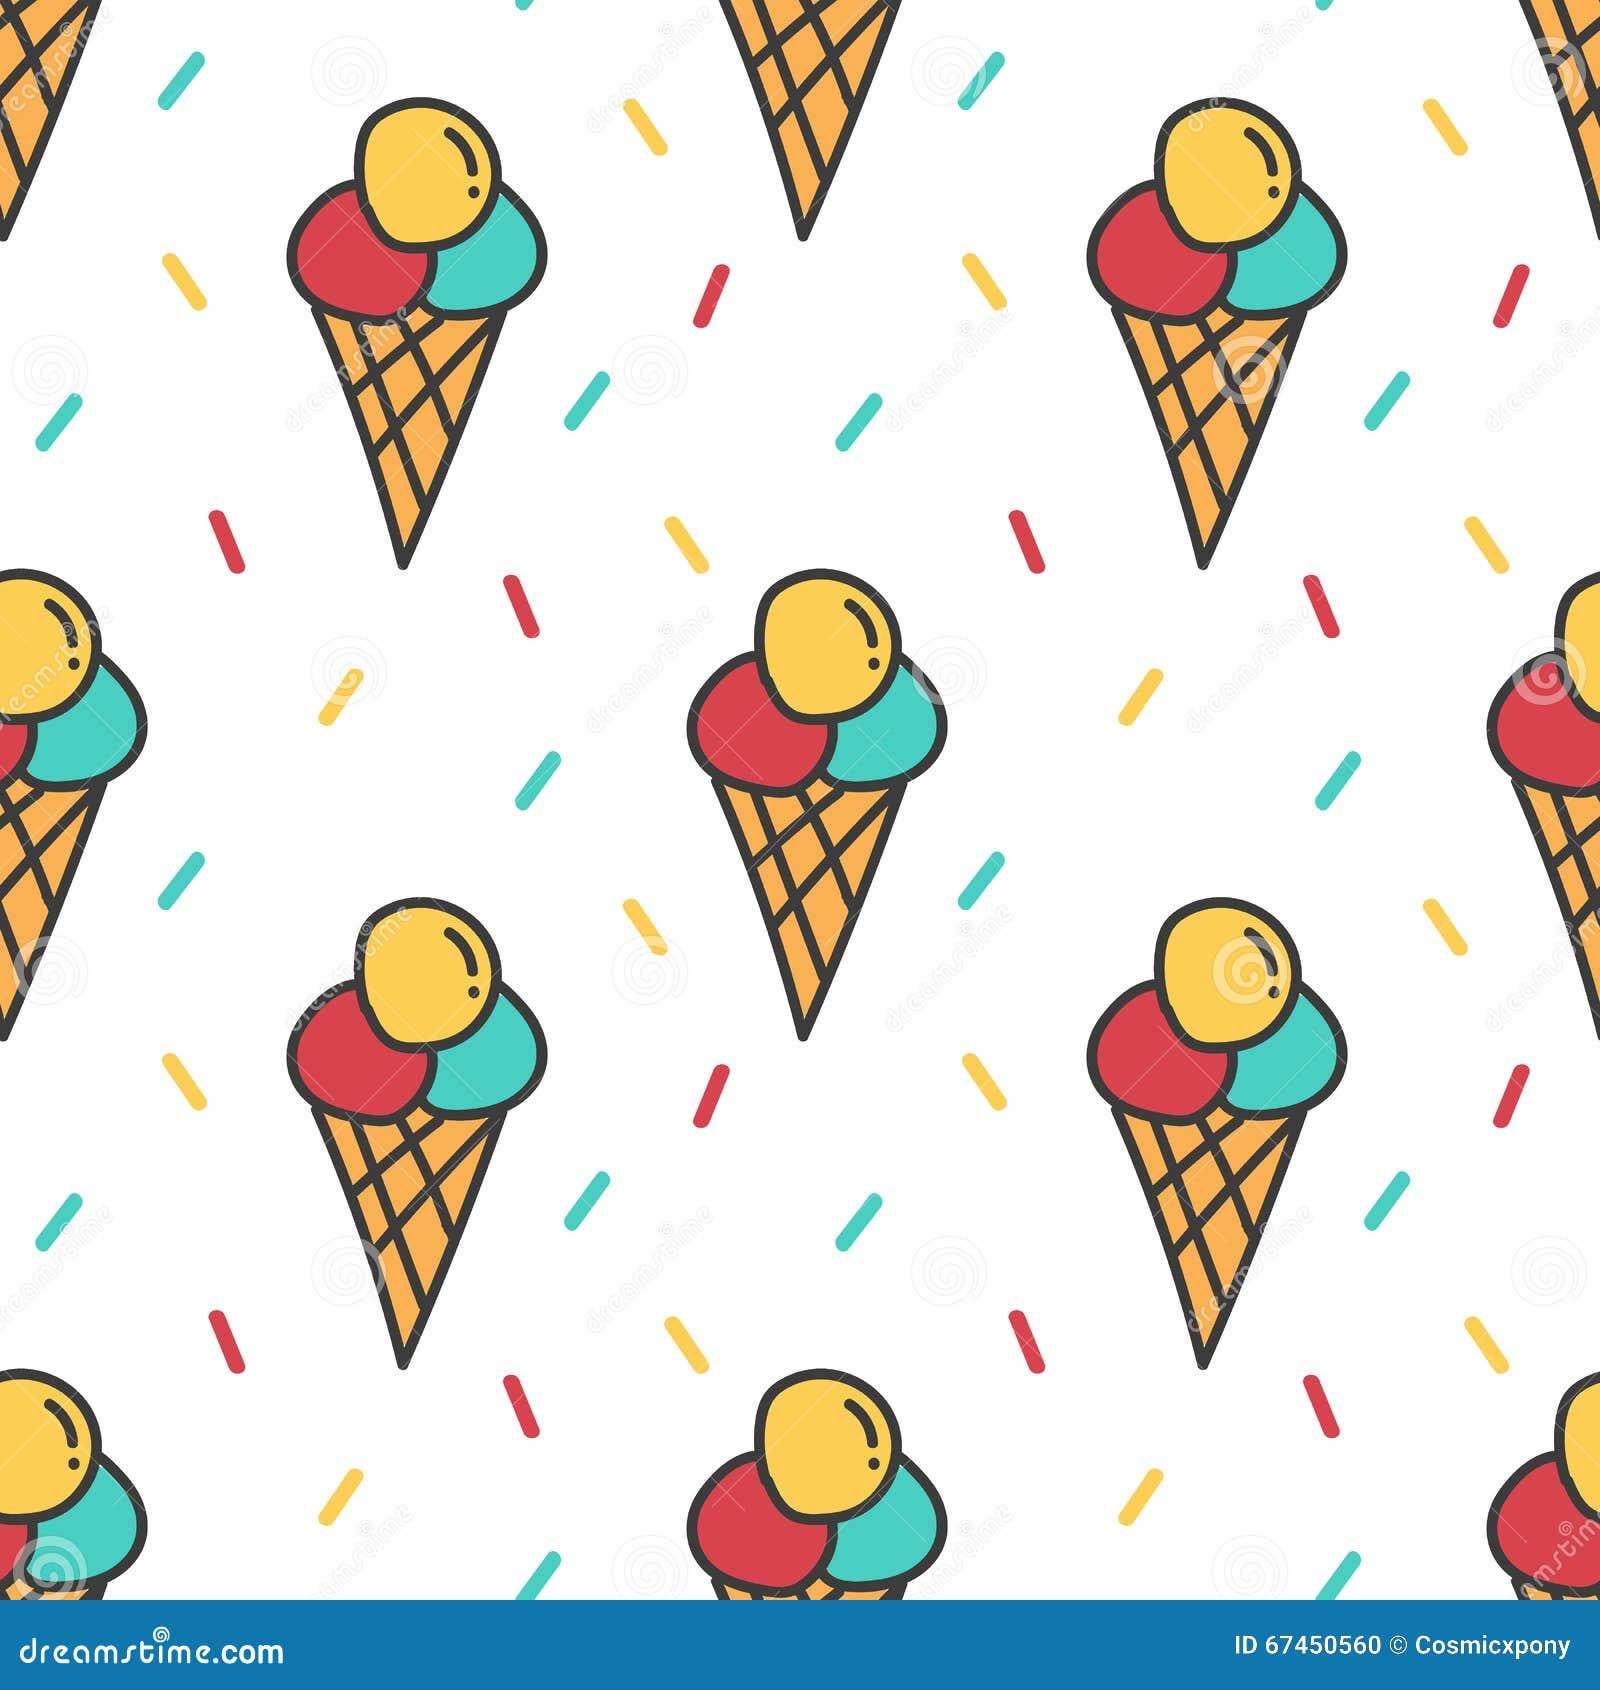 Cute Colorful Ice Cream Seamless Pattern Background: Ice Cream And Colorful Confetti Seamless Pattern